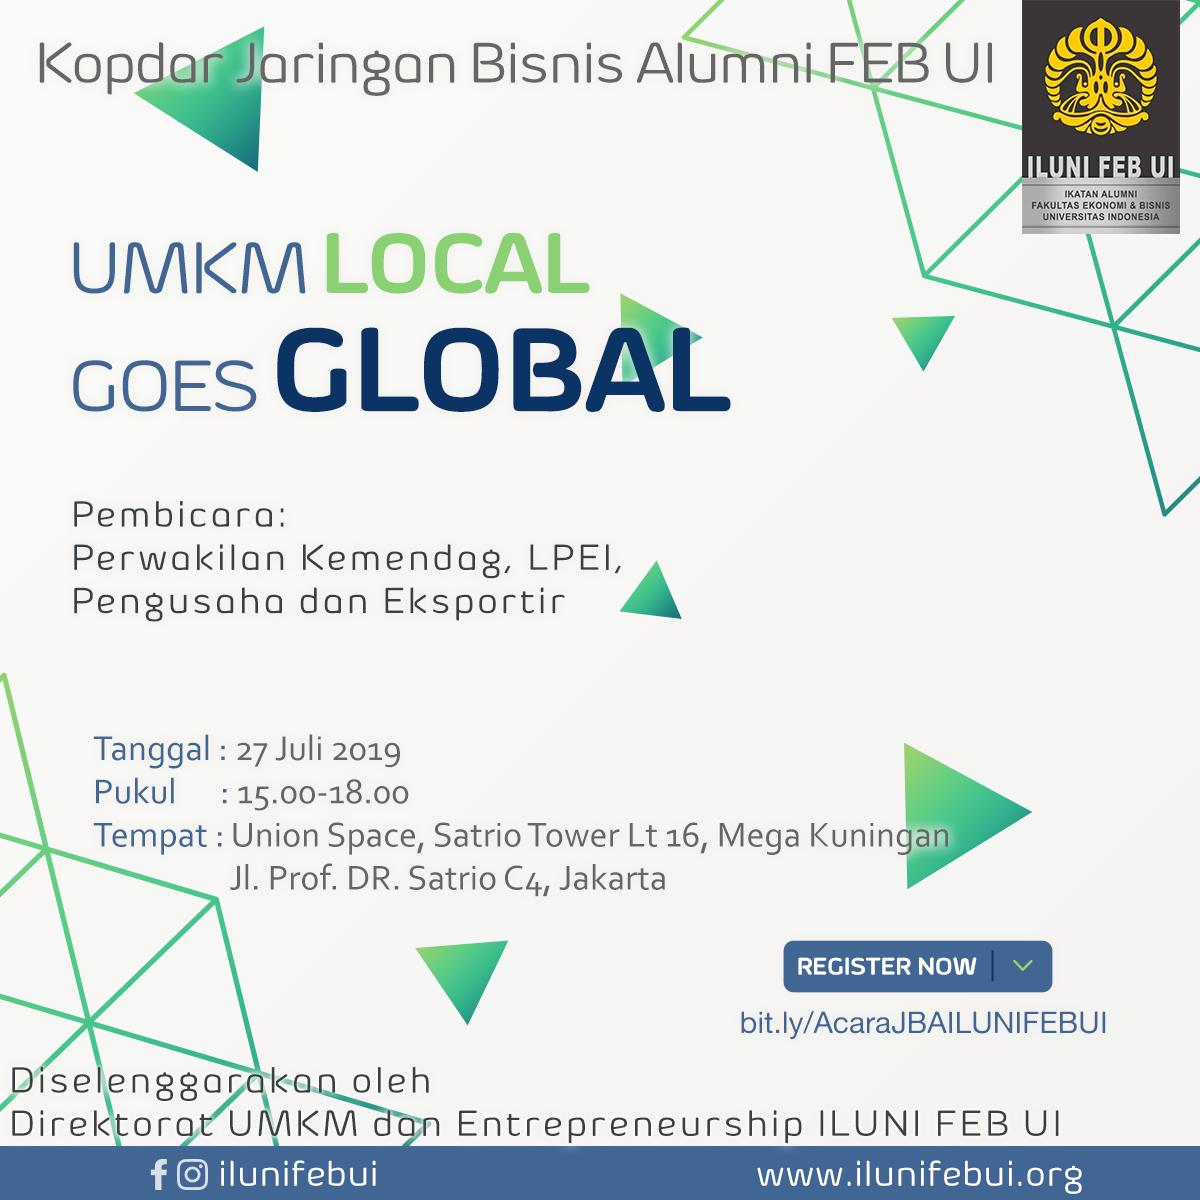 UMKM Local Goes Global